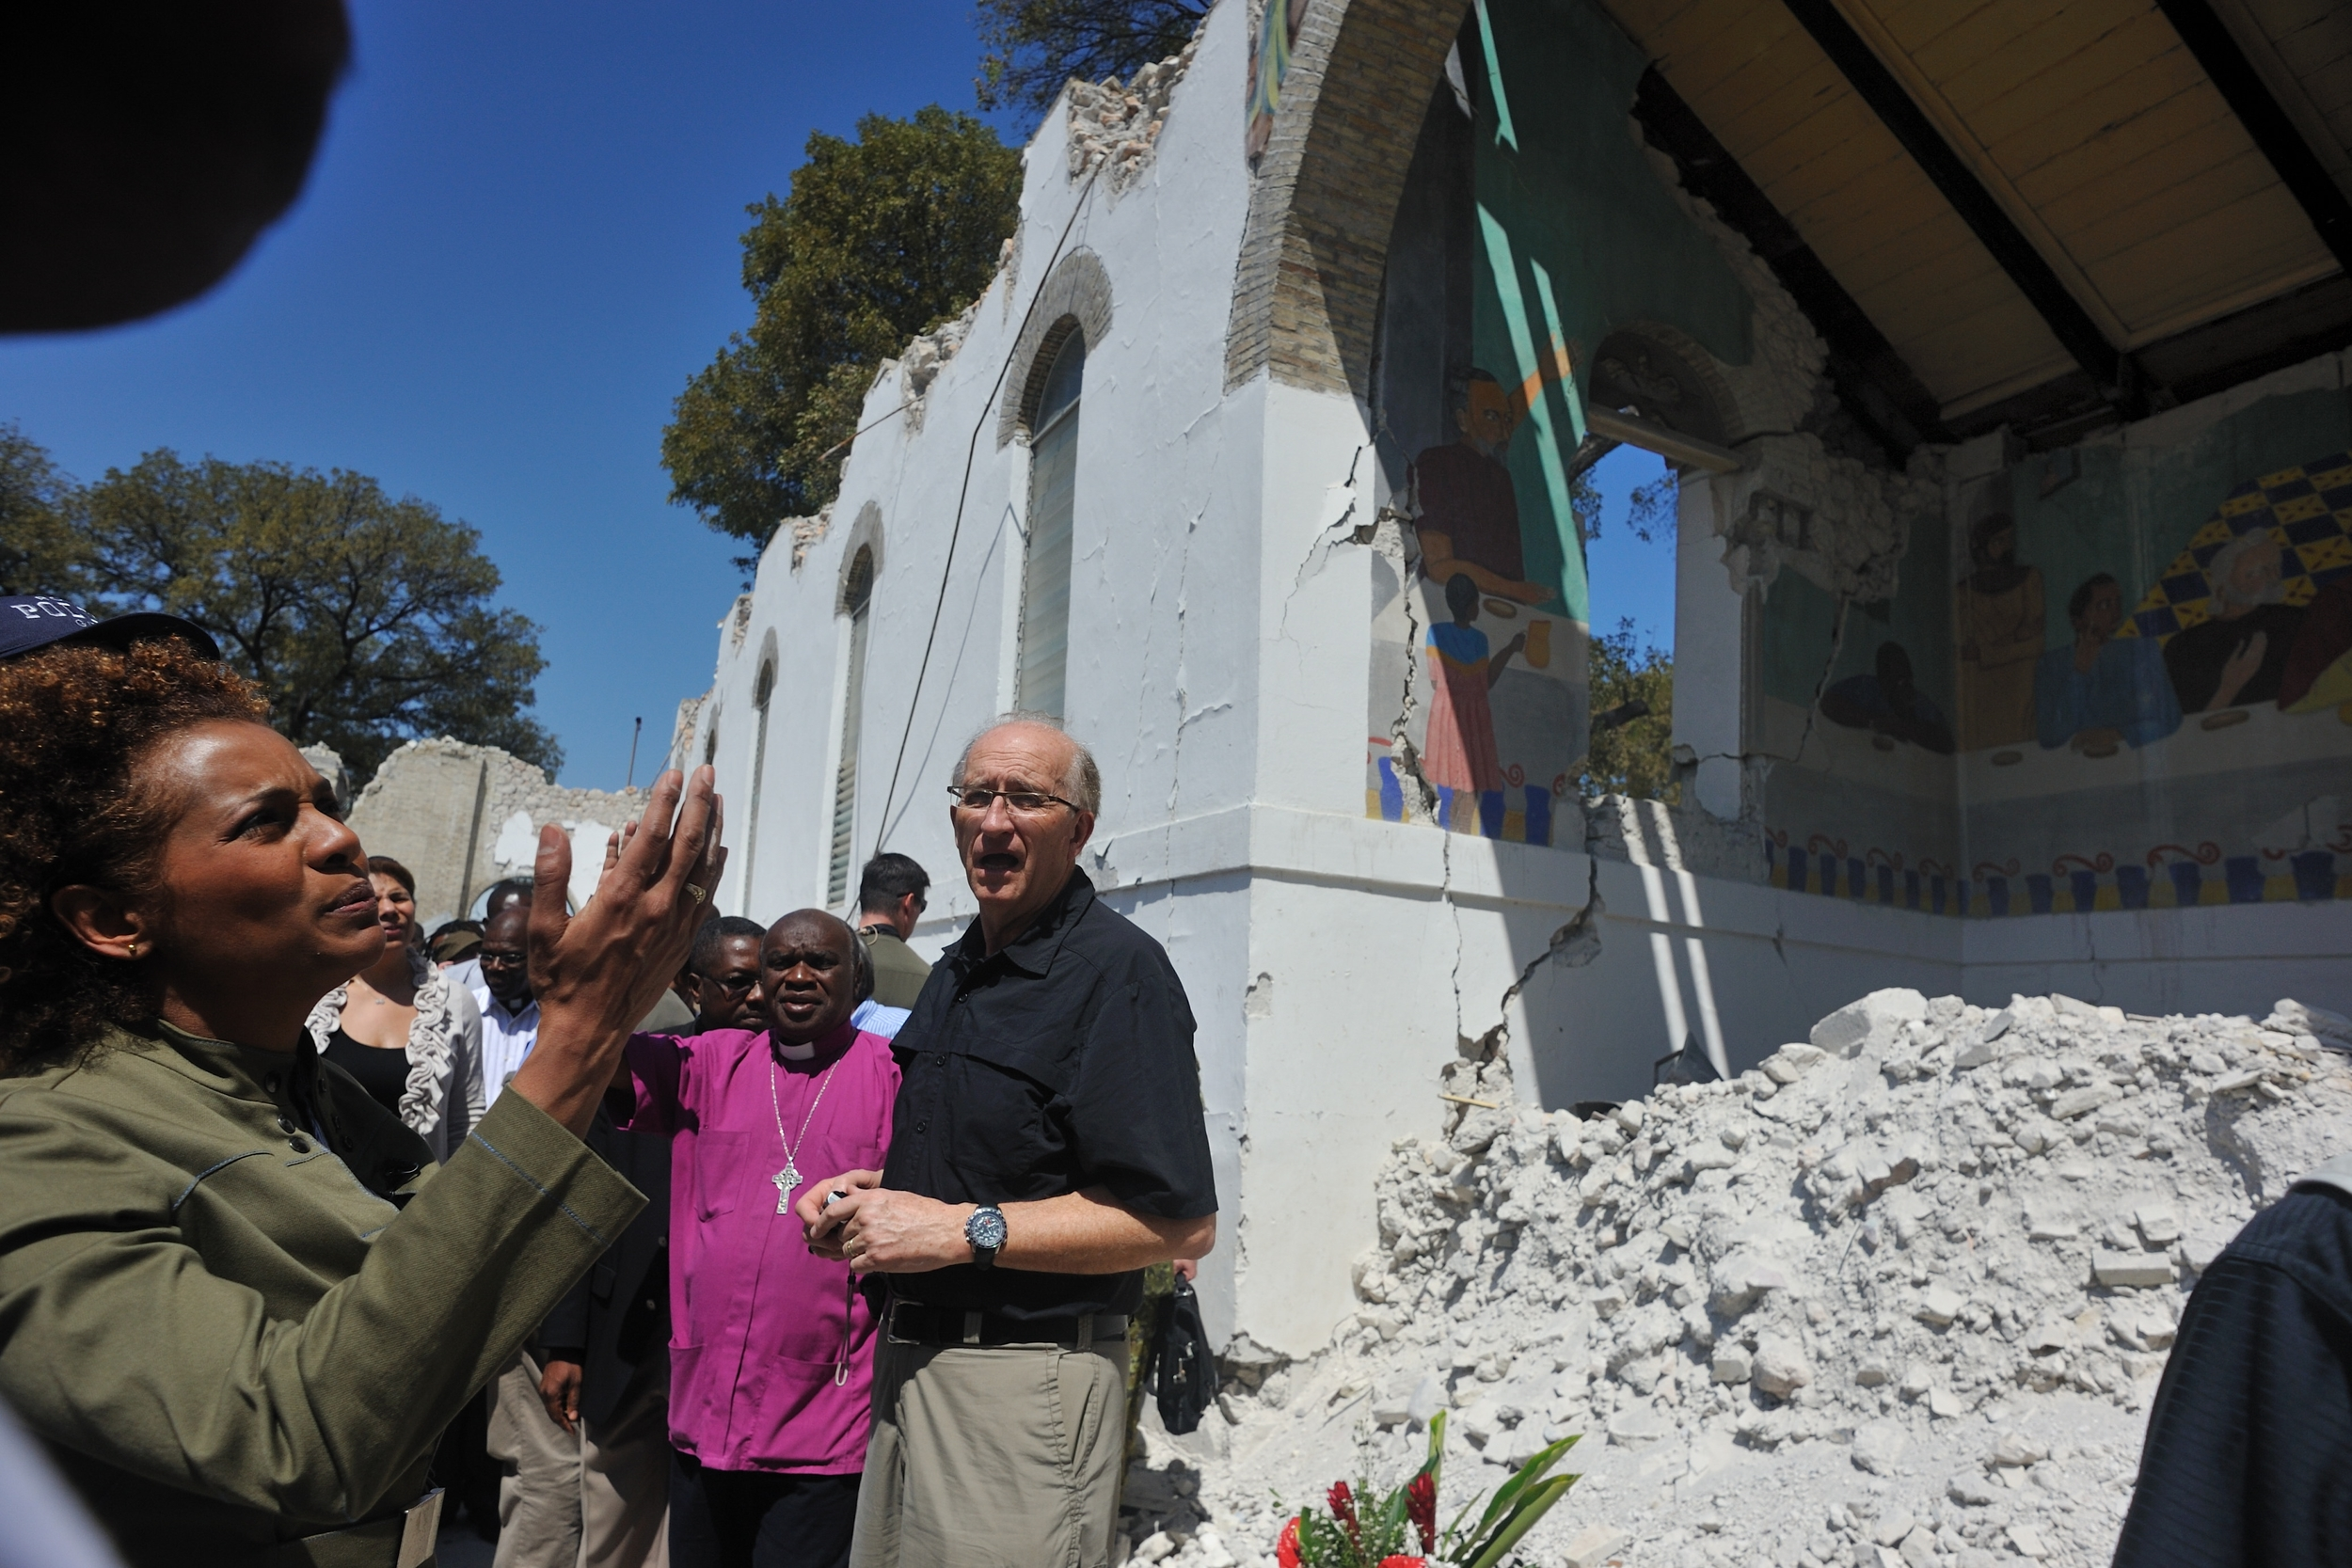 Their Excellencies visit locations in Port-au-Prince including the Cathédrale Épiscopale and the Sainte-Trinité school.